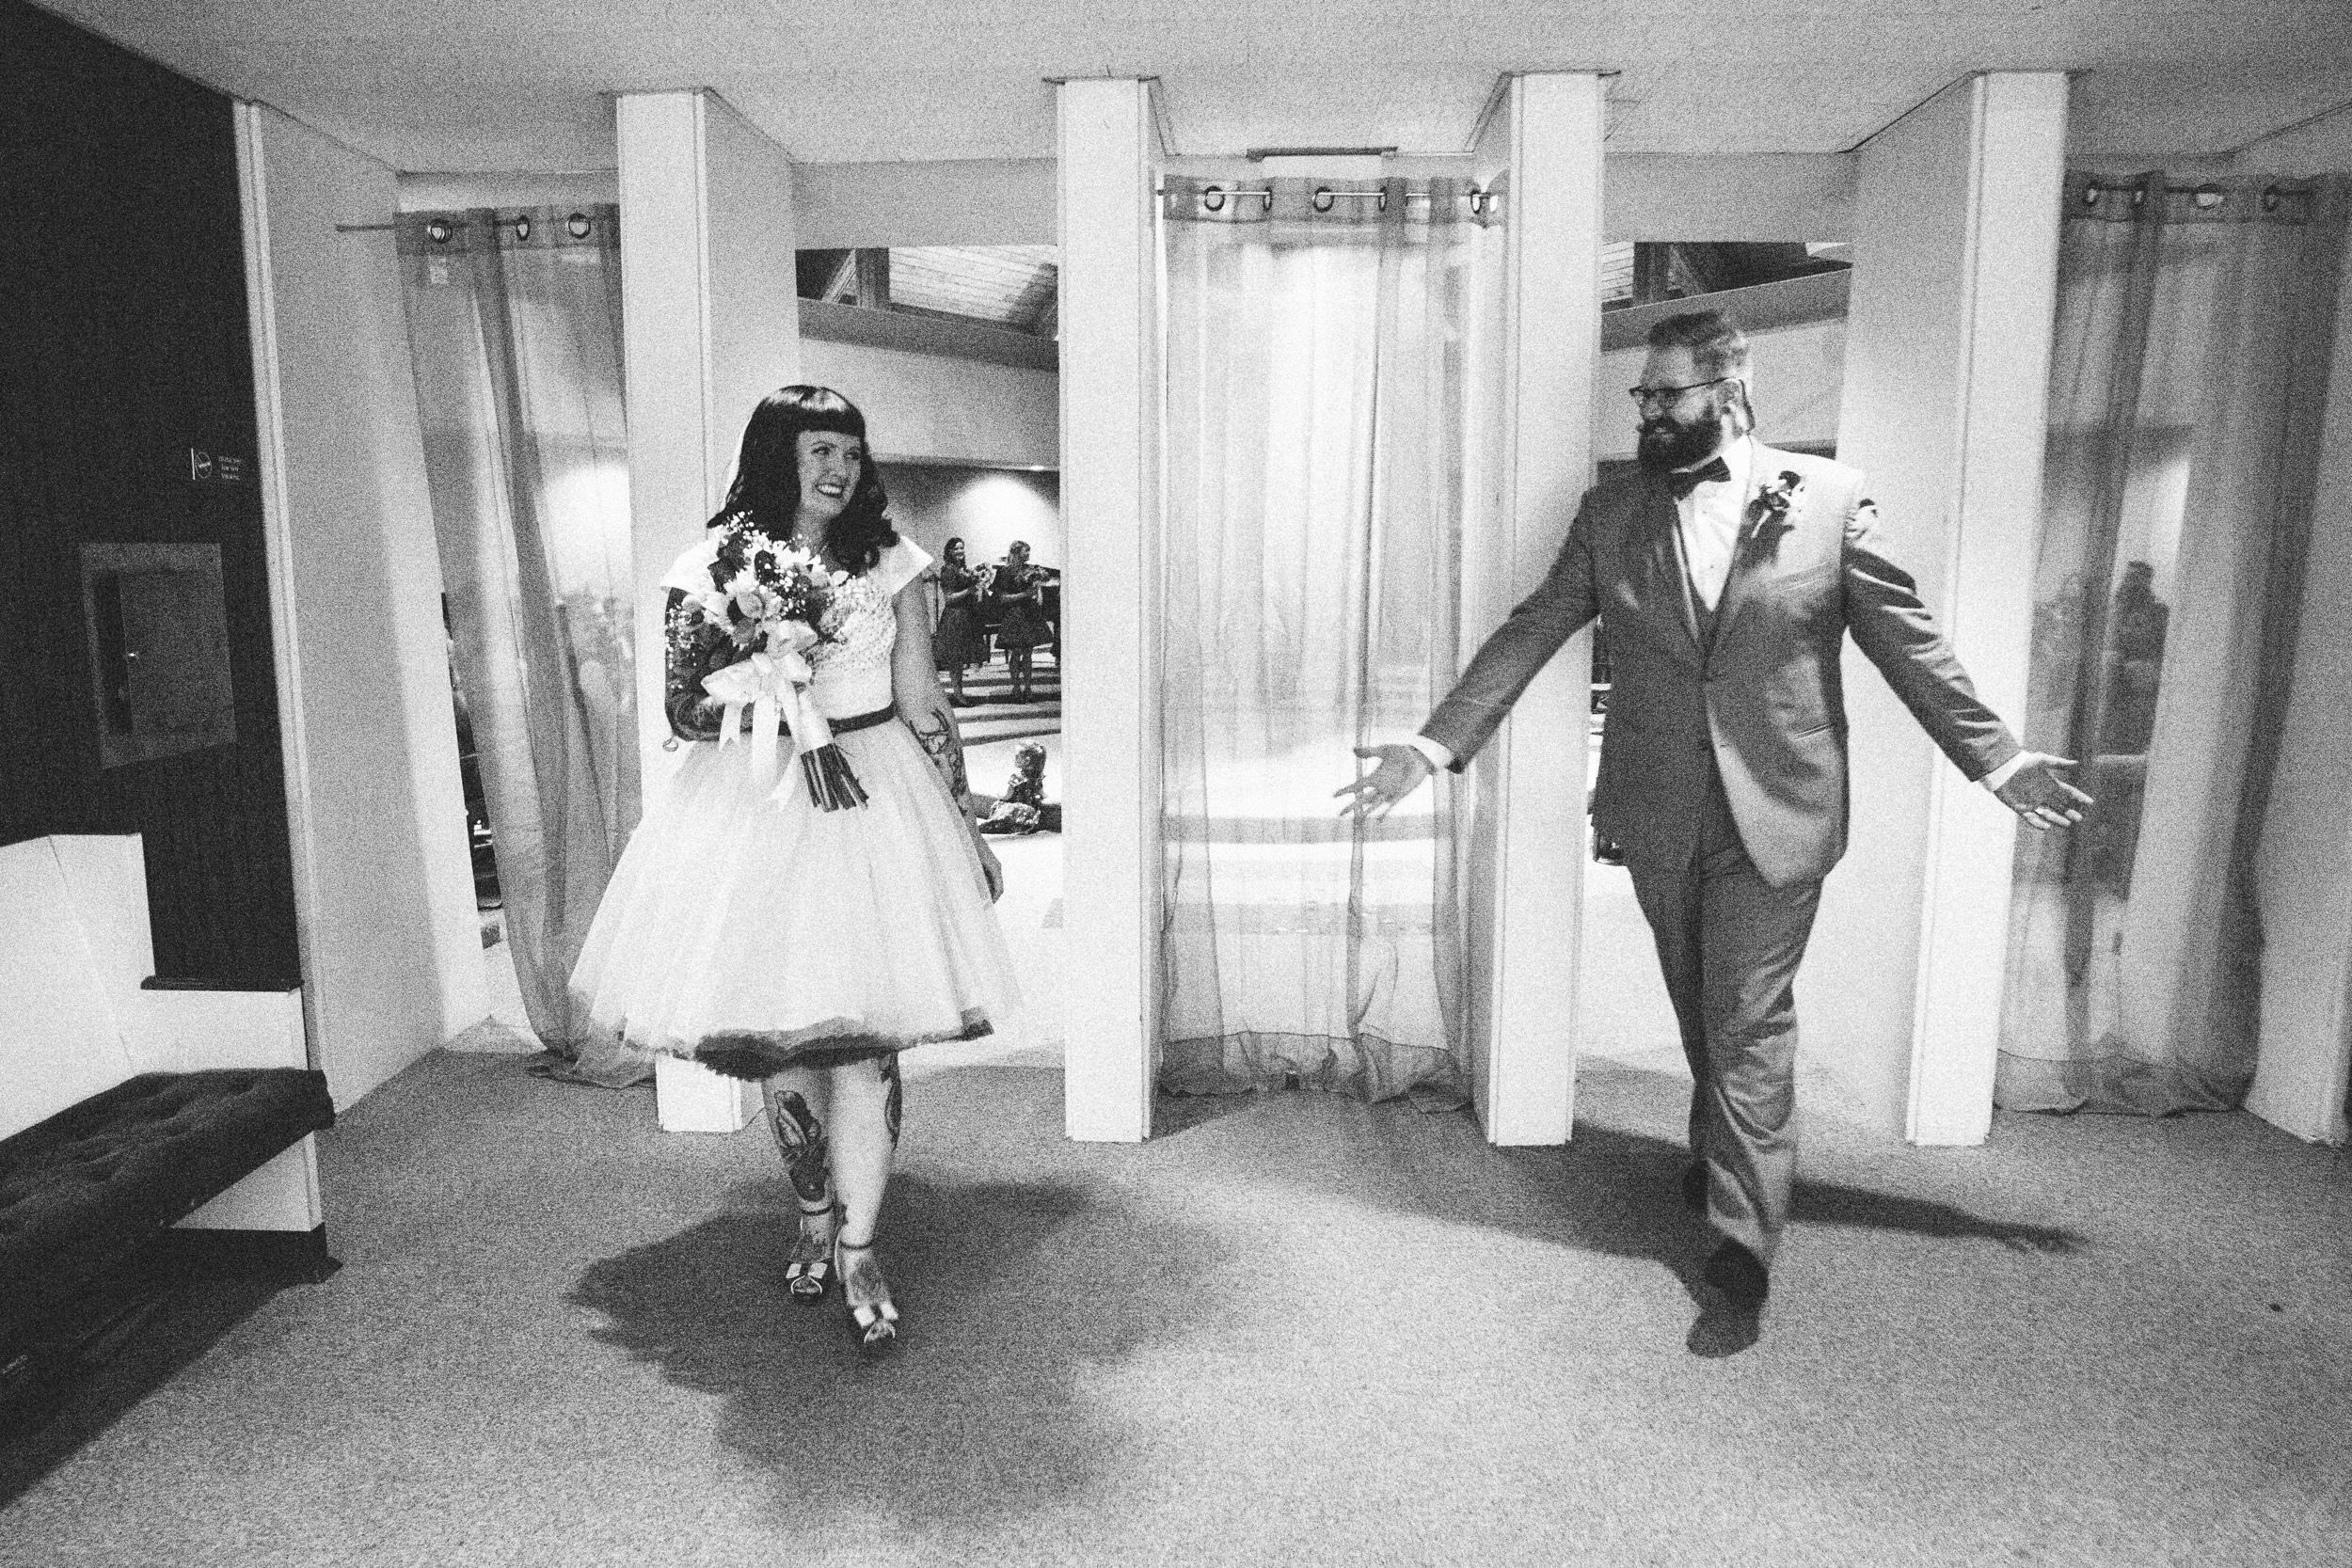 Christian & Sarah wedding photography by Brian milo-174.jpg